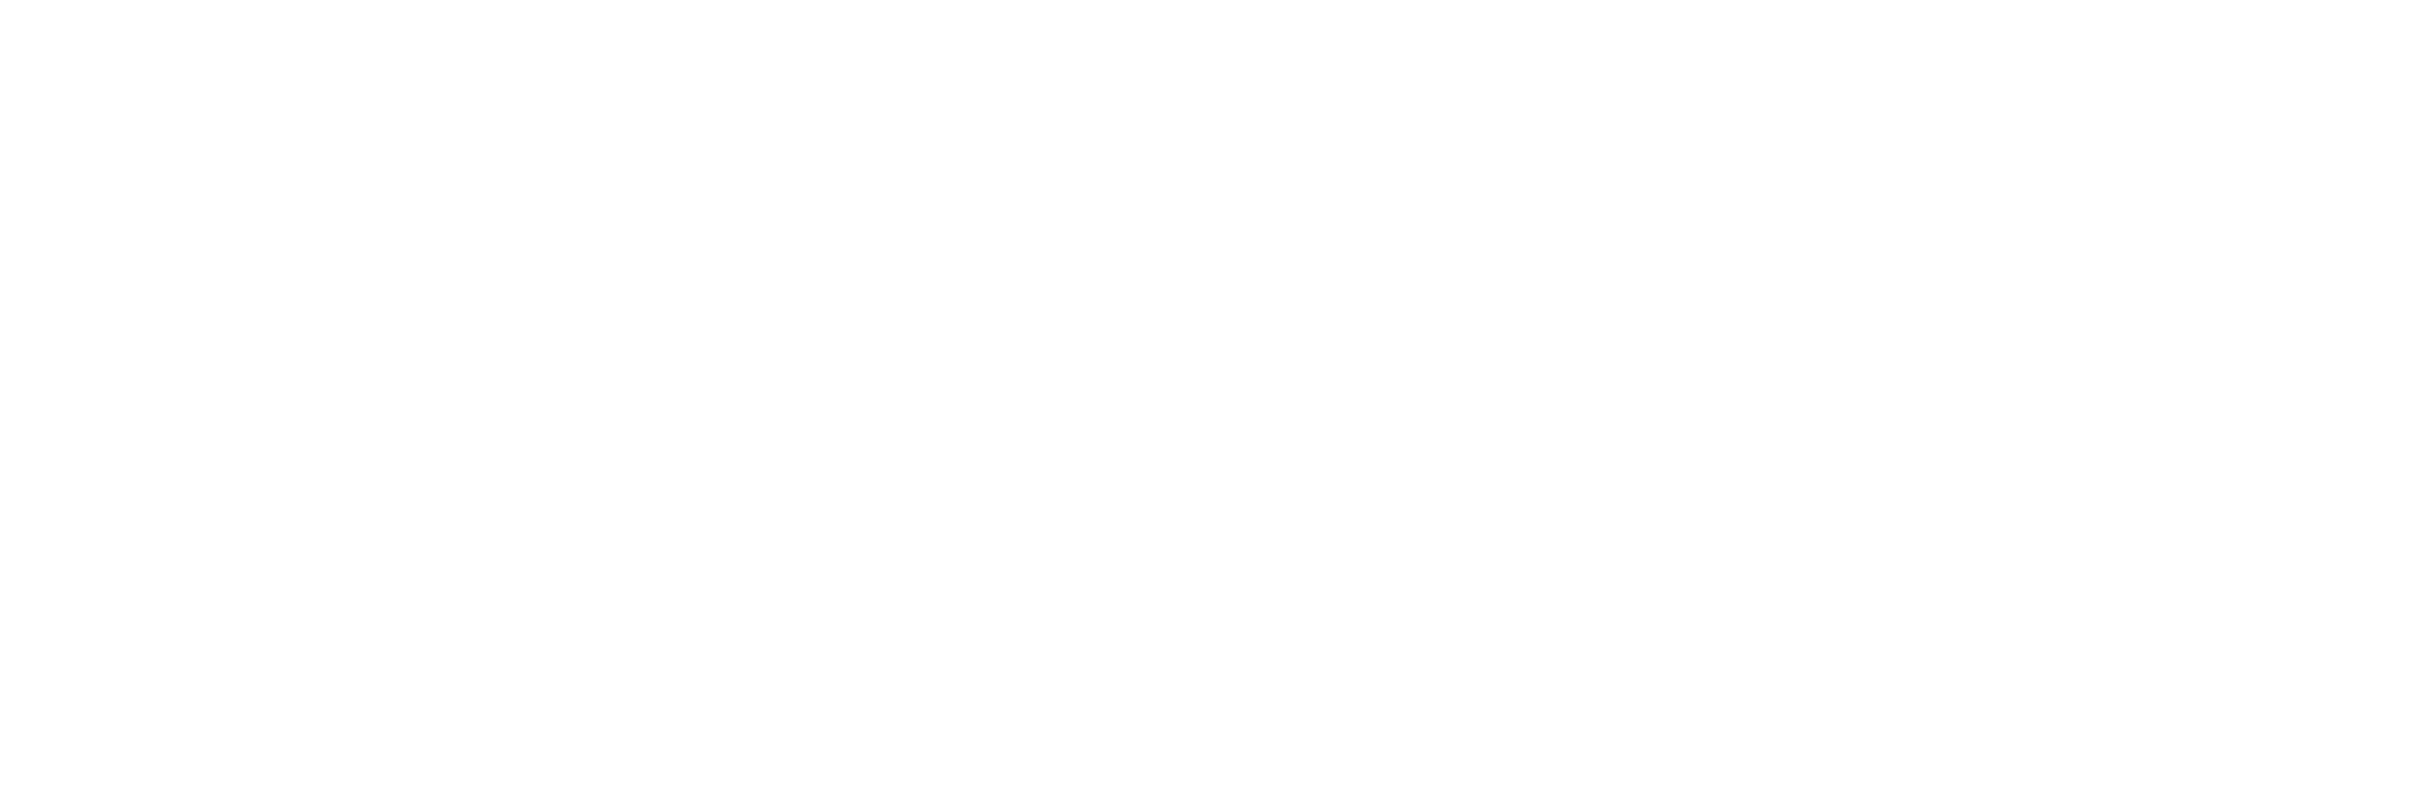 Federicstore